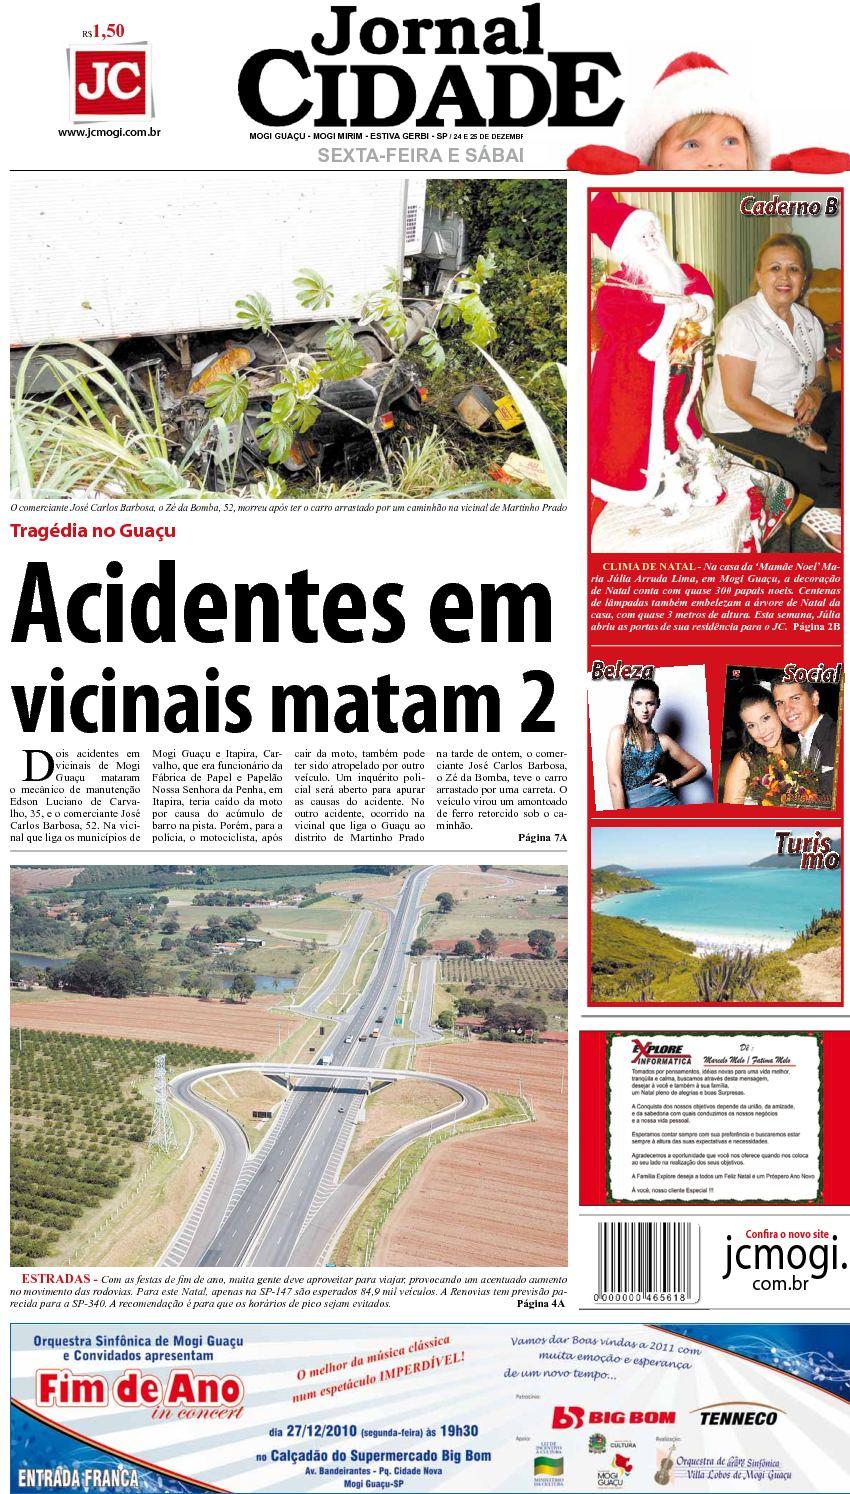 b2d2b382e Calaméo - JC MOGI GUAÇU - 24-12-2010